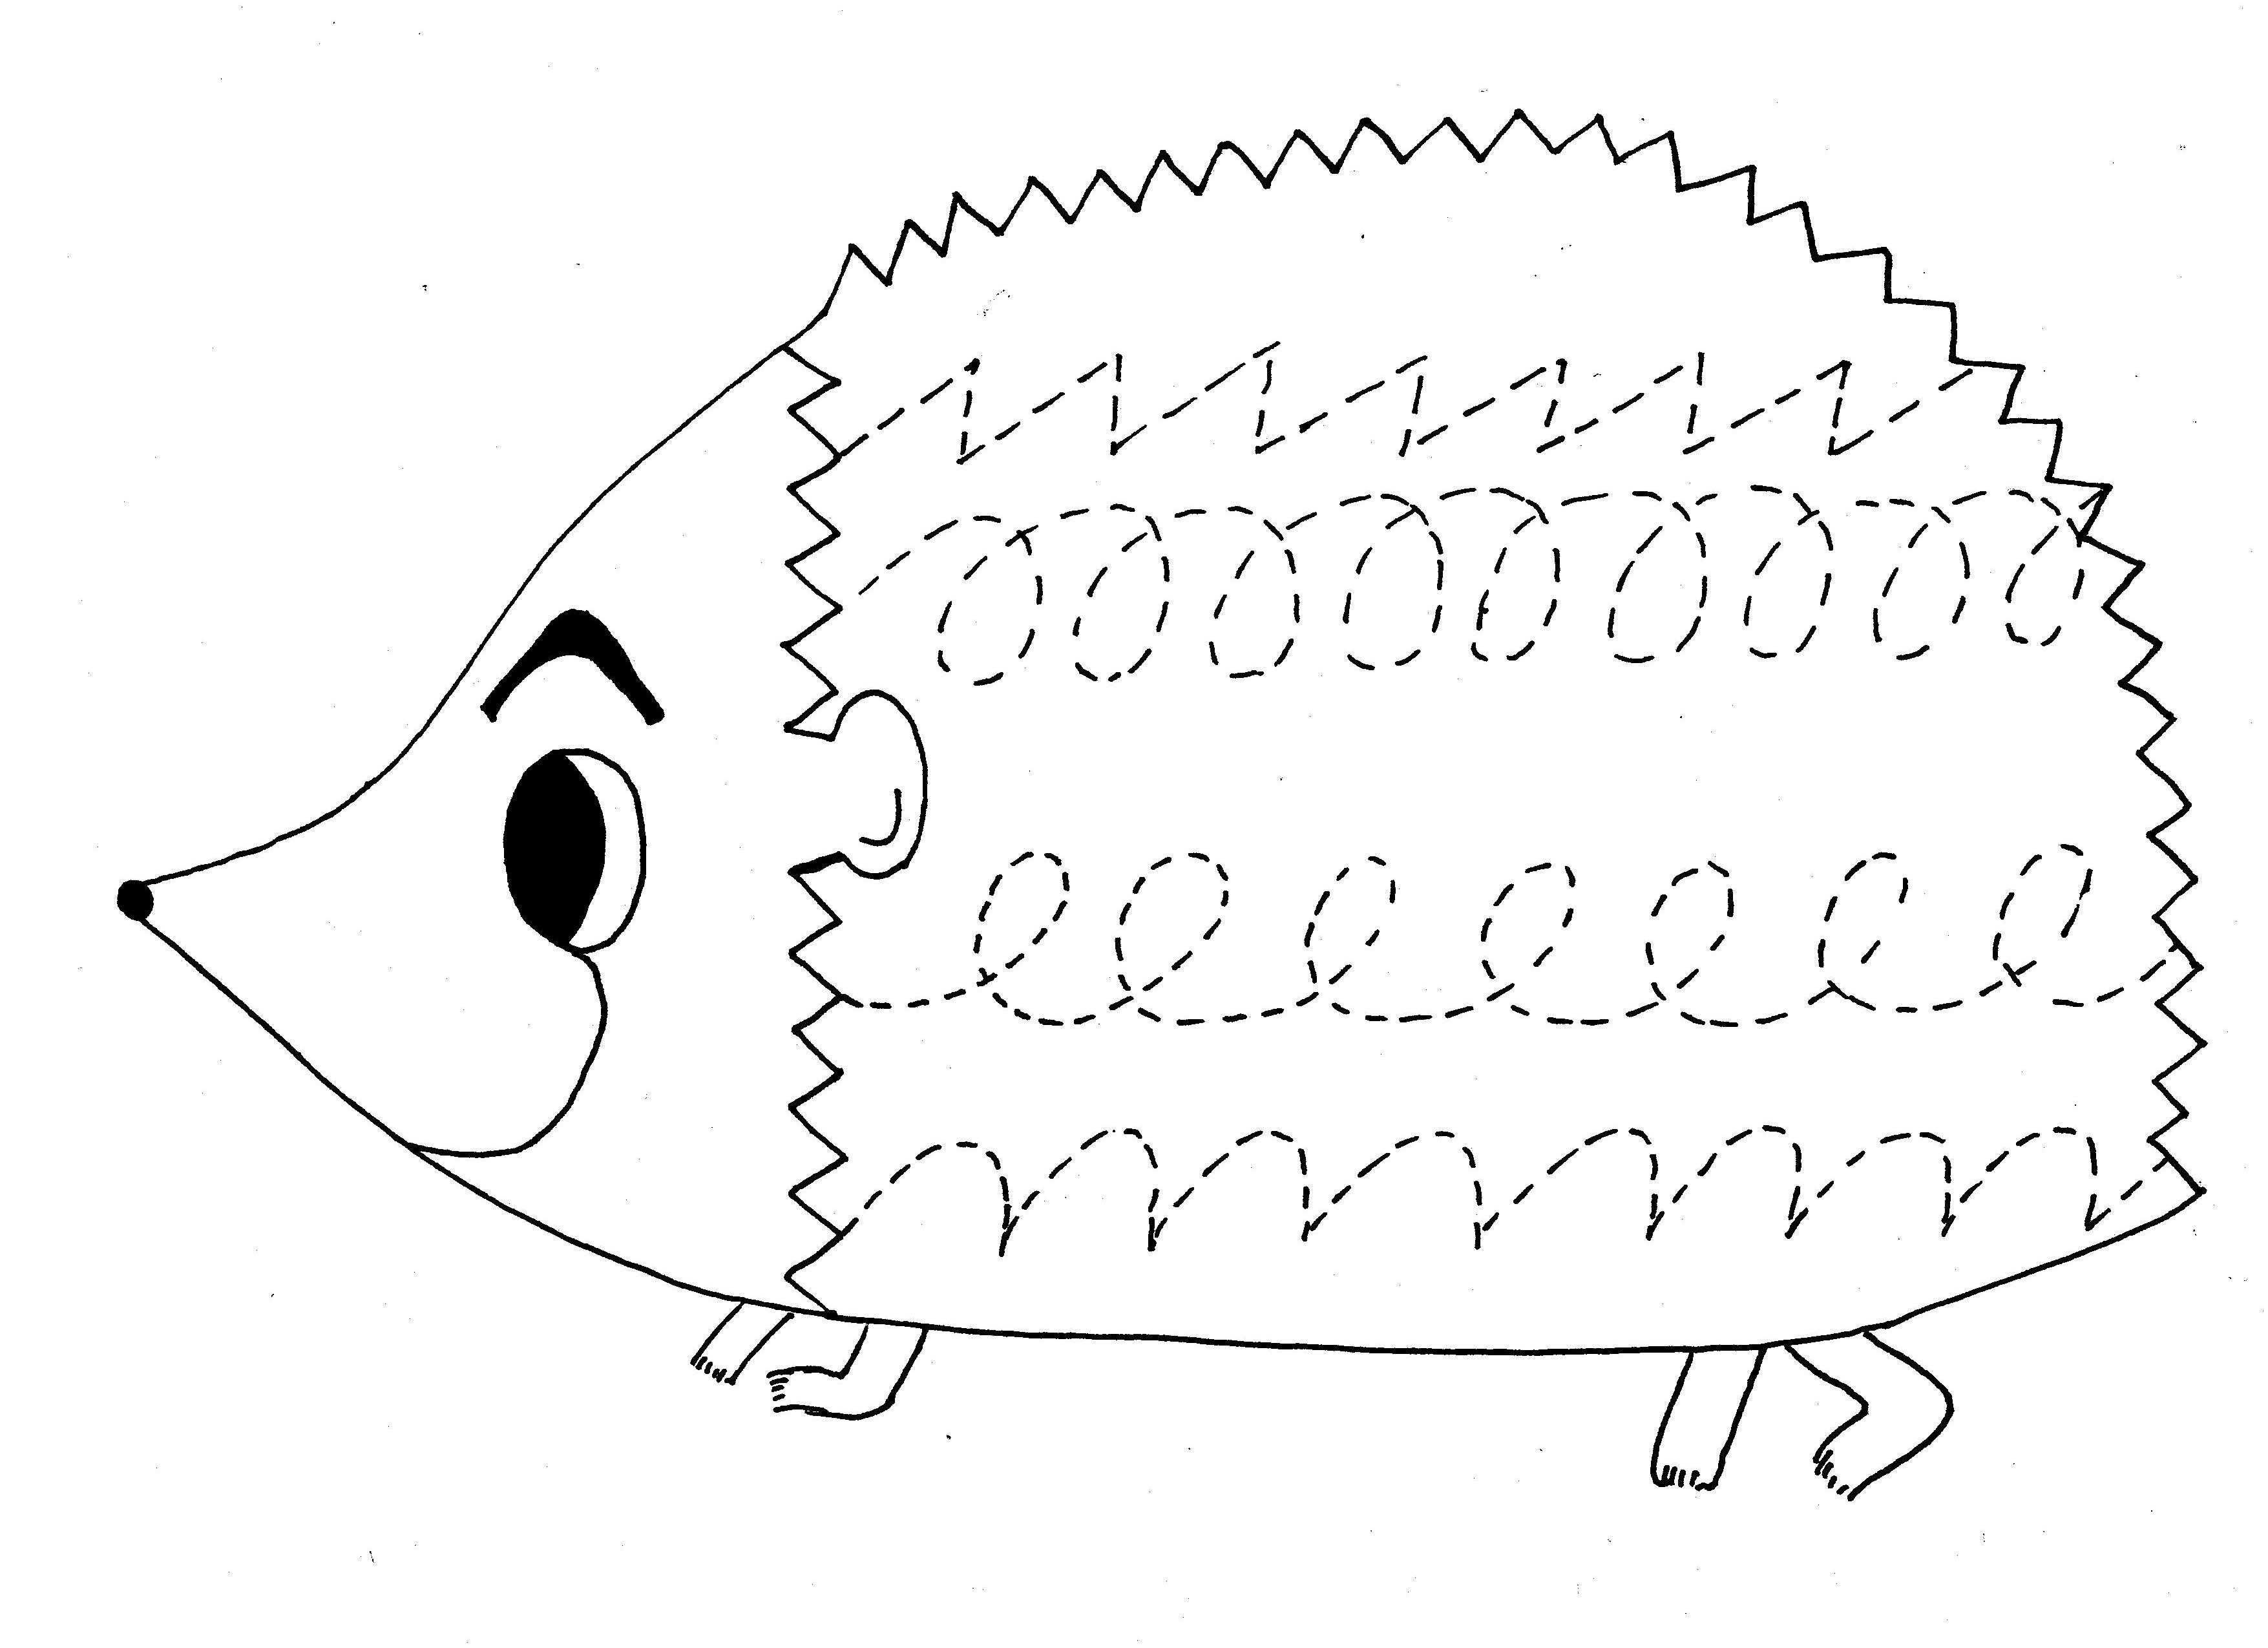 Writing Skills For Preschoolers Worksheet – With Beginning Also Free - Free Printable Fine Motor Skills Worksheets